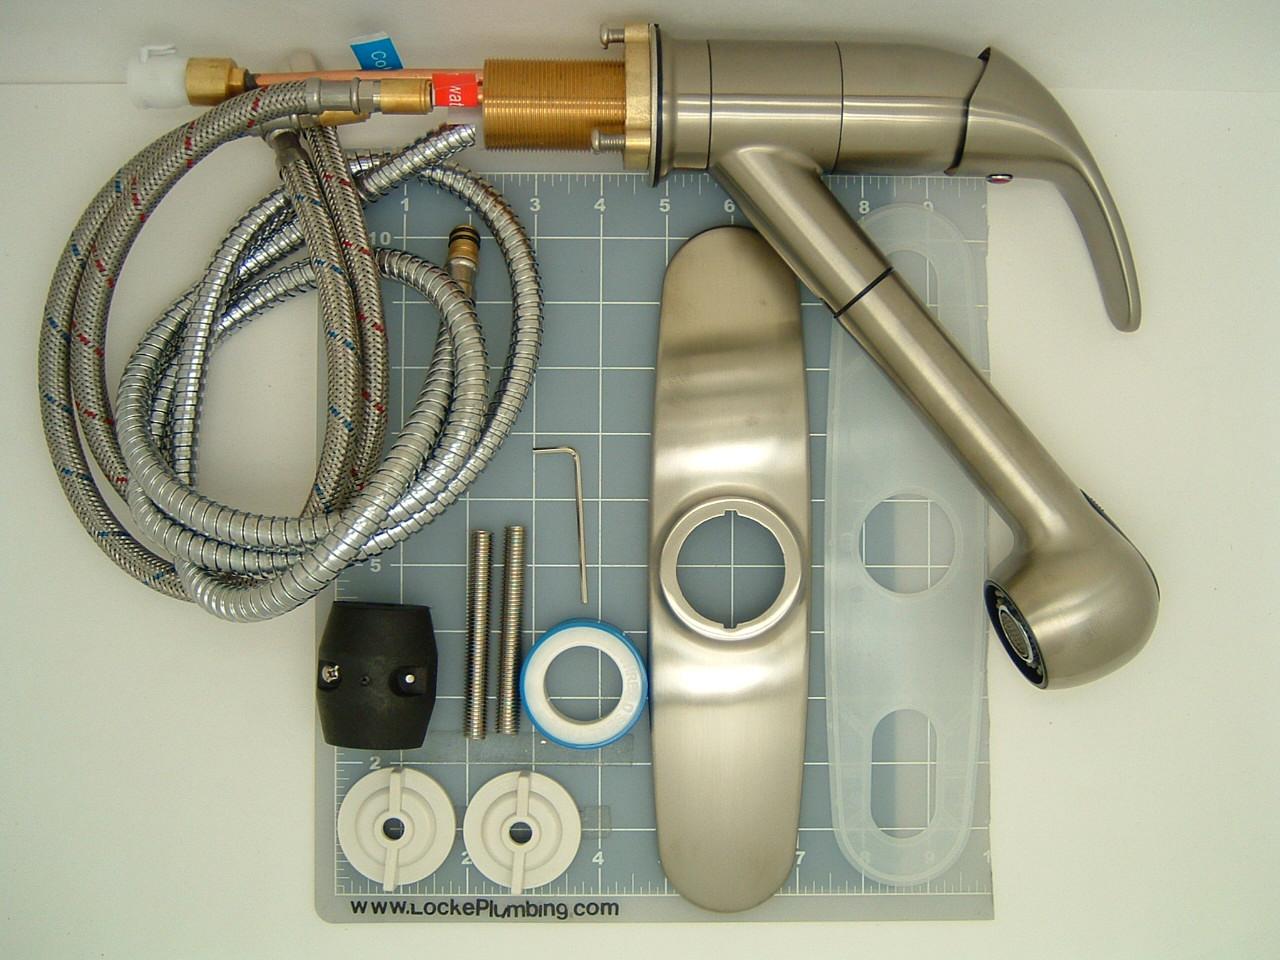 WB 85503 Brushed Nickel Essence Single Handle Kitchen Pull